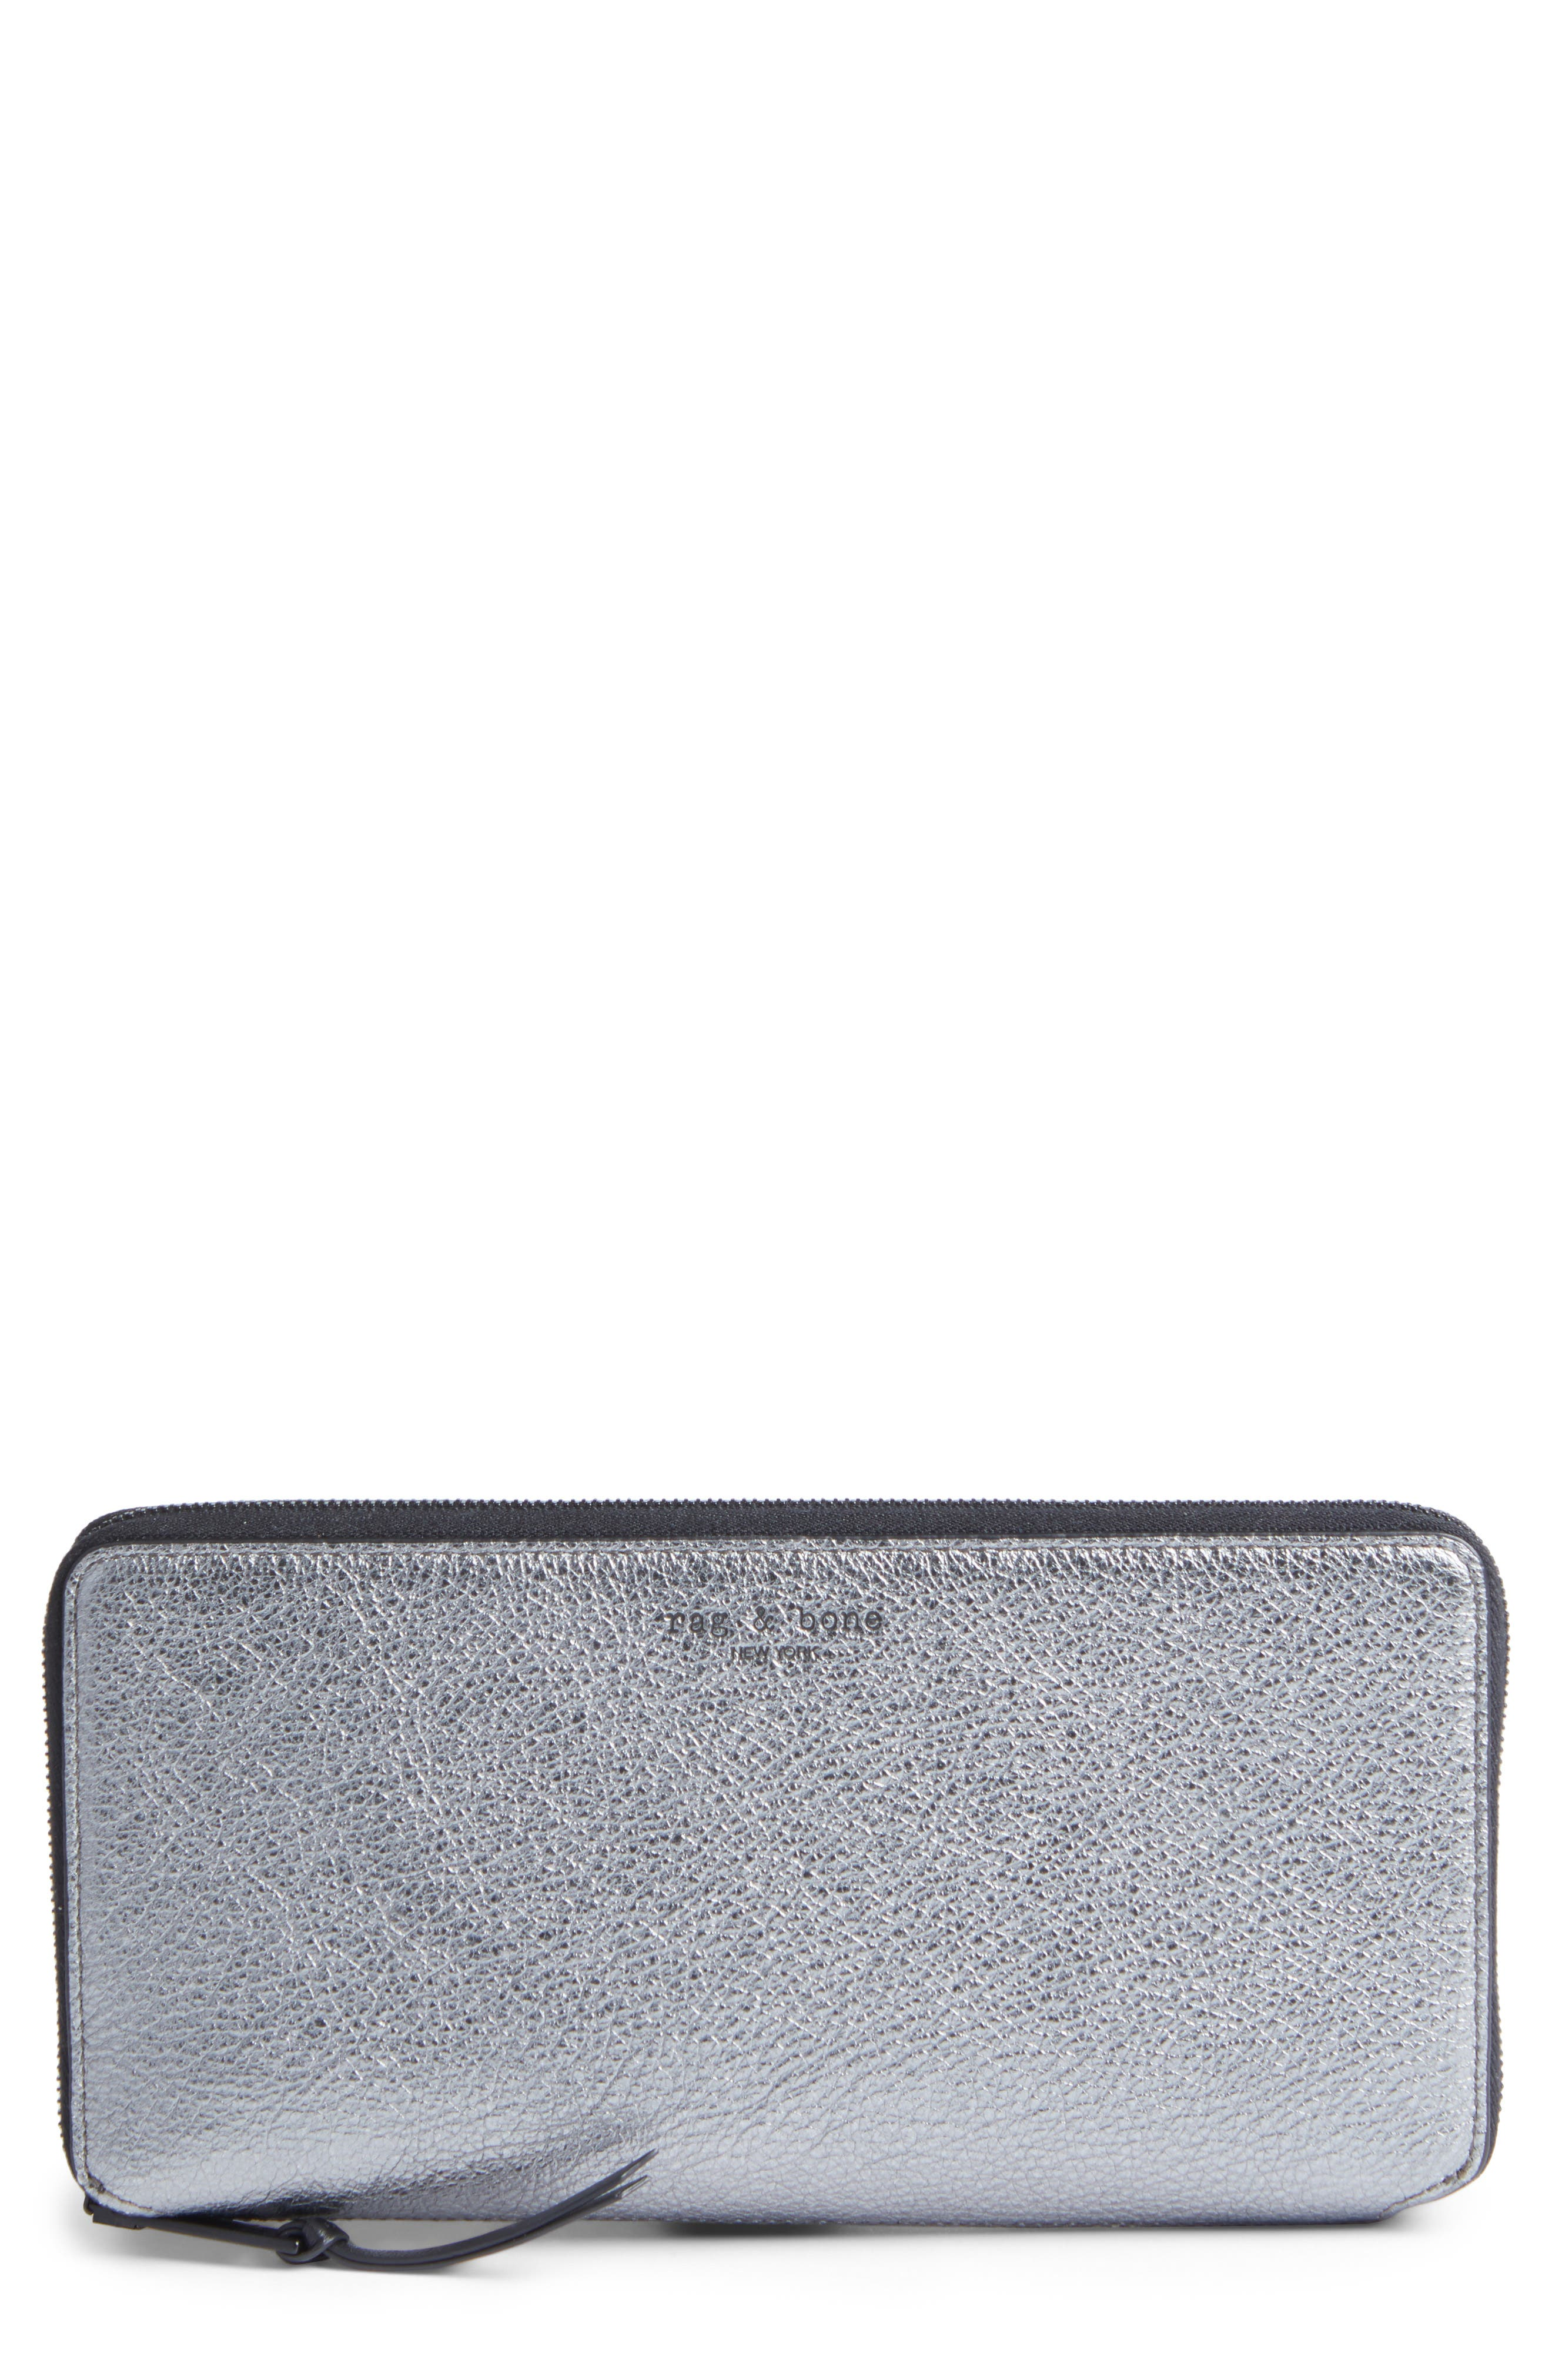 Main Image - rag & bone Metallic Leather Zip-Around Wallet